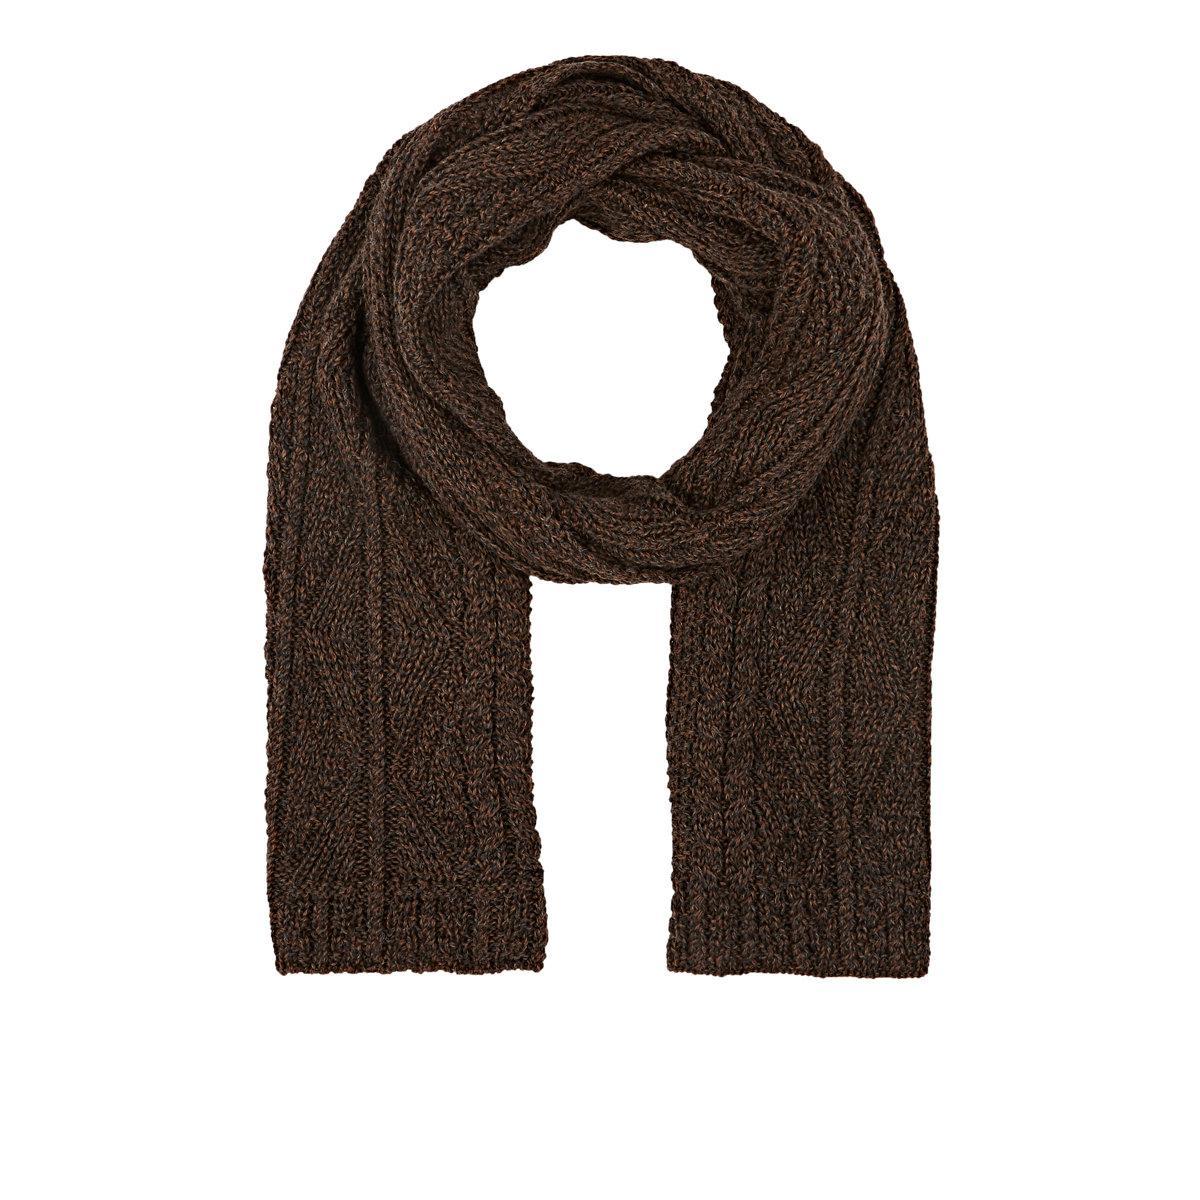 Alpaca Aran Knitting Pattern : Inis meain Aran-knit Alpaca in Brown Lyst